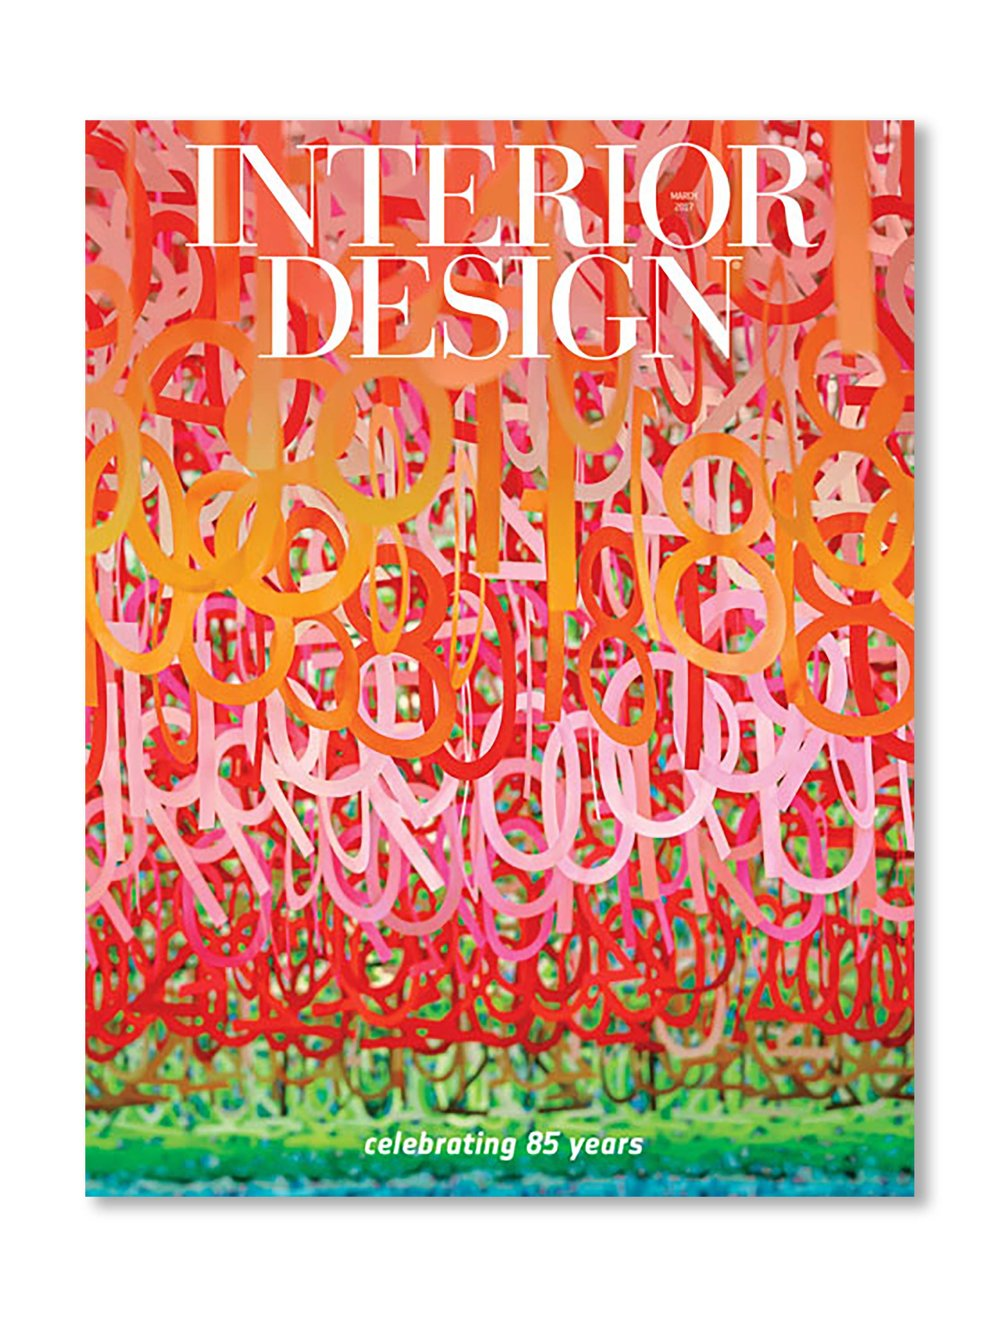 Bean Buro_Interior Design New York_March 17_Cover.jpg